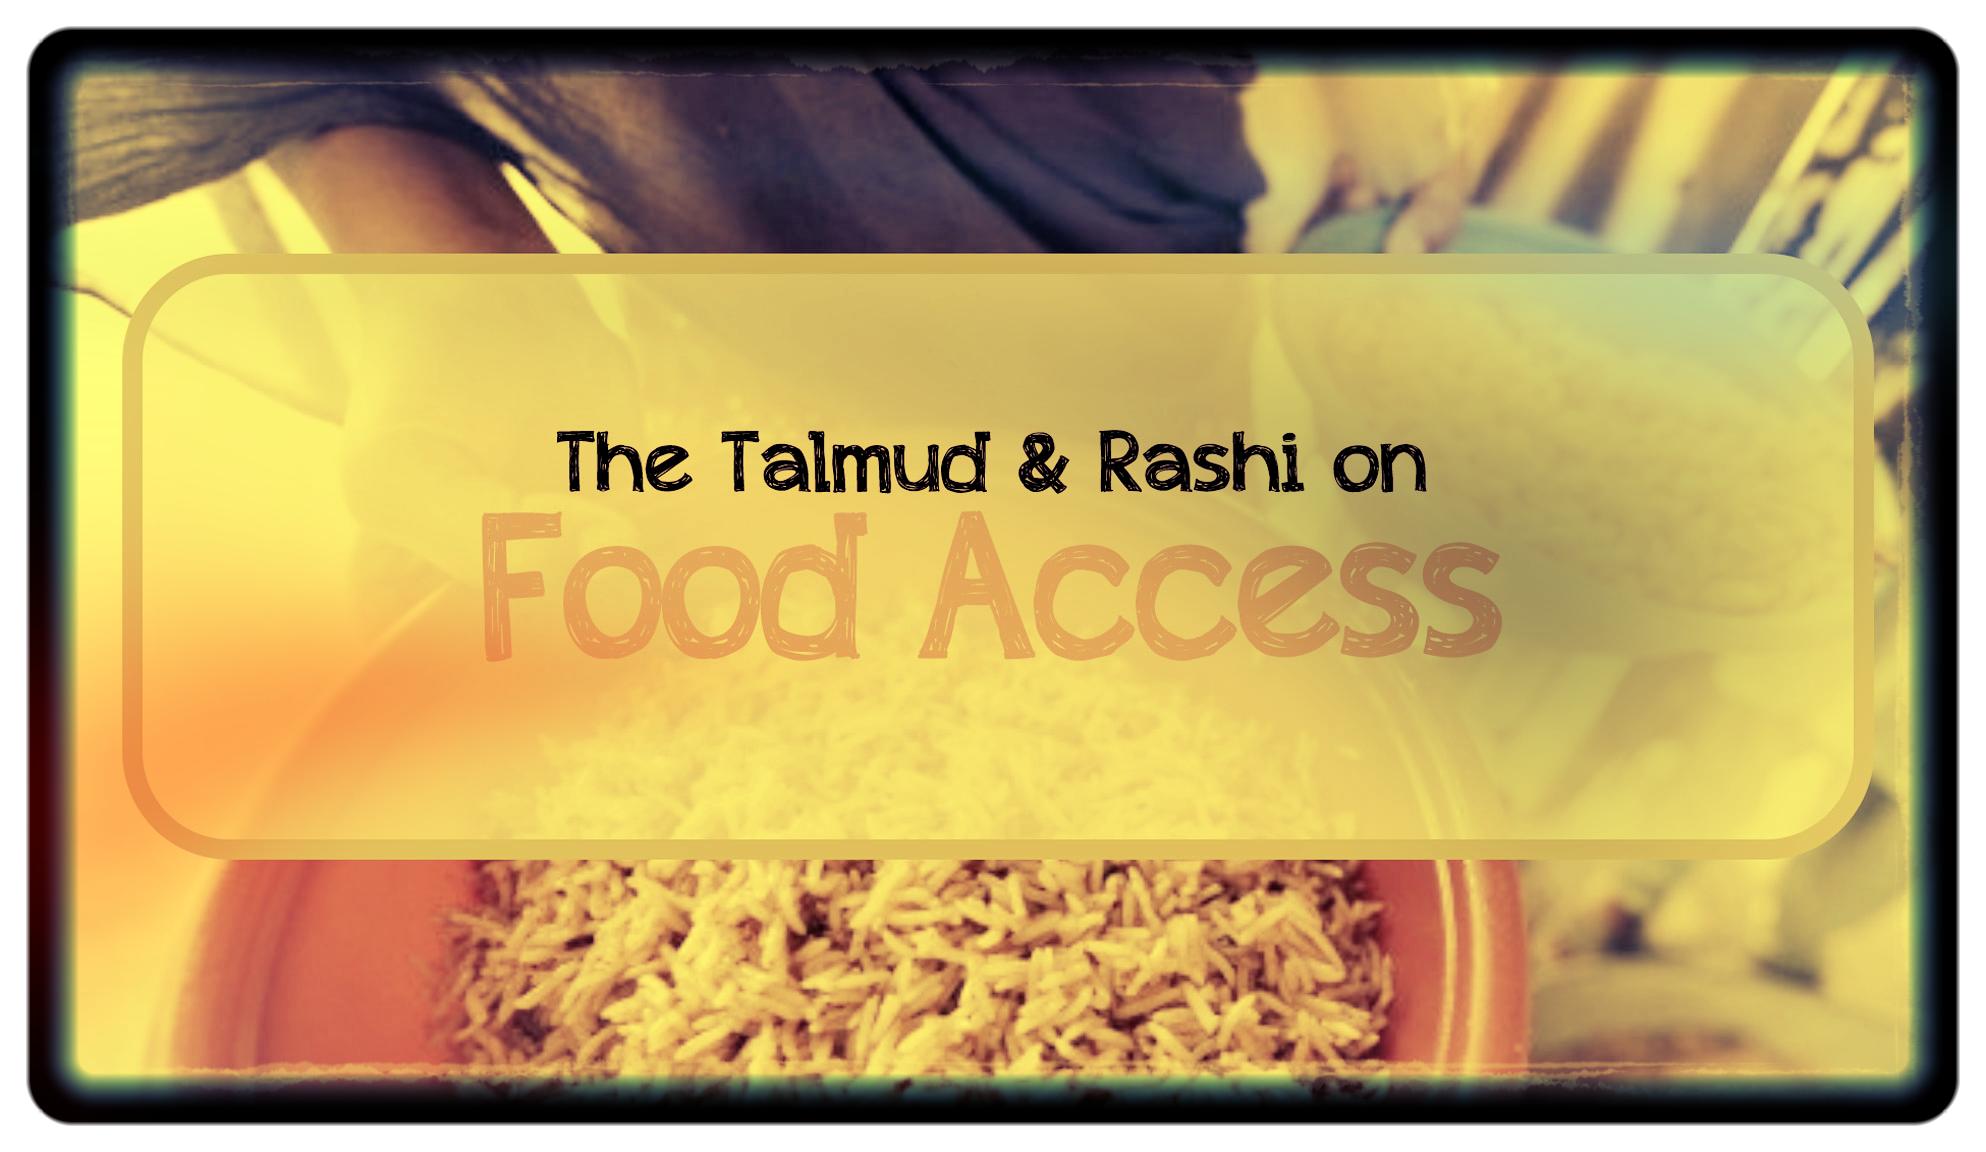 FoodAccess.jpg